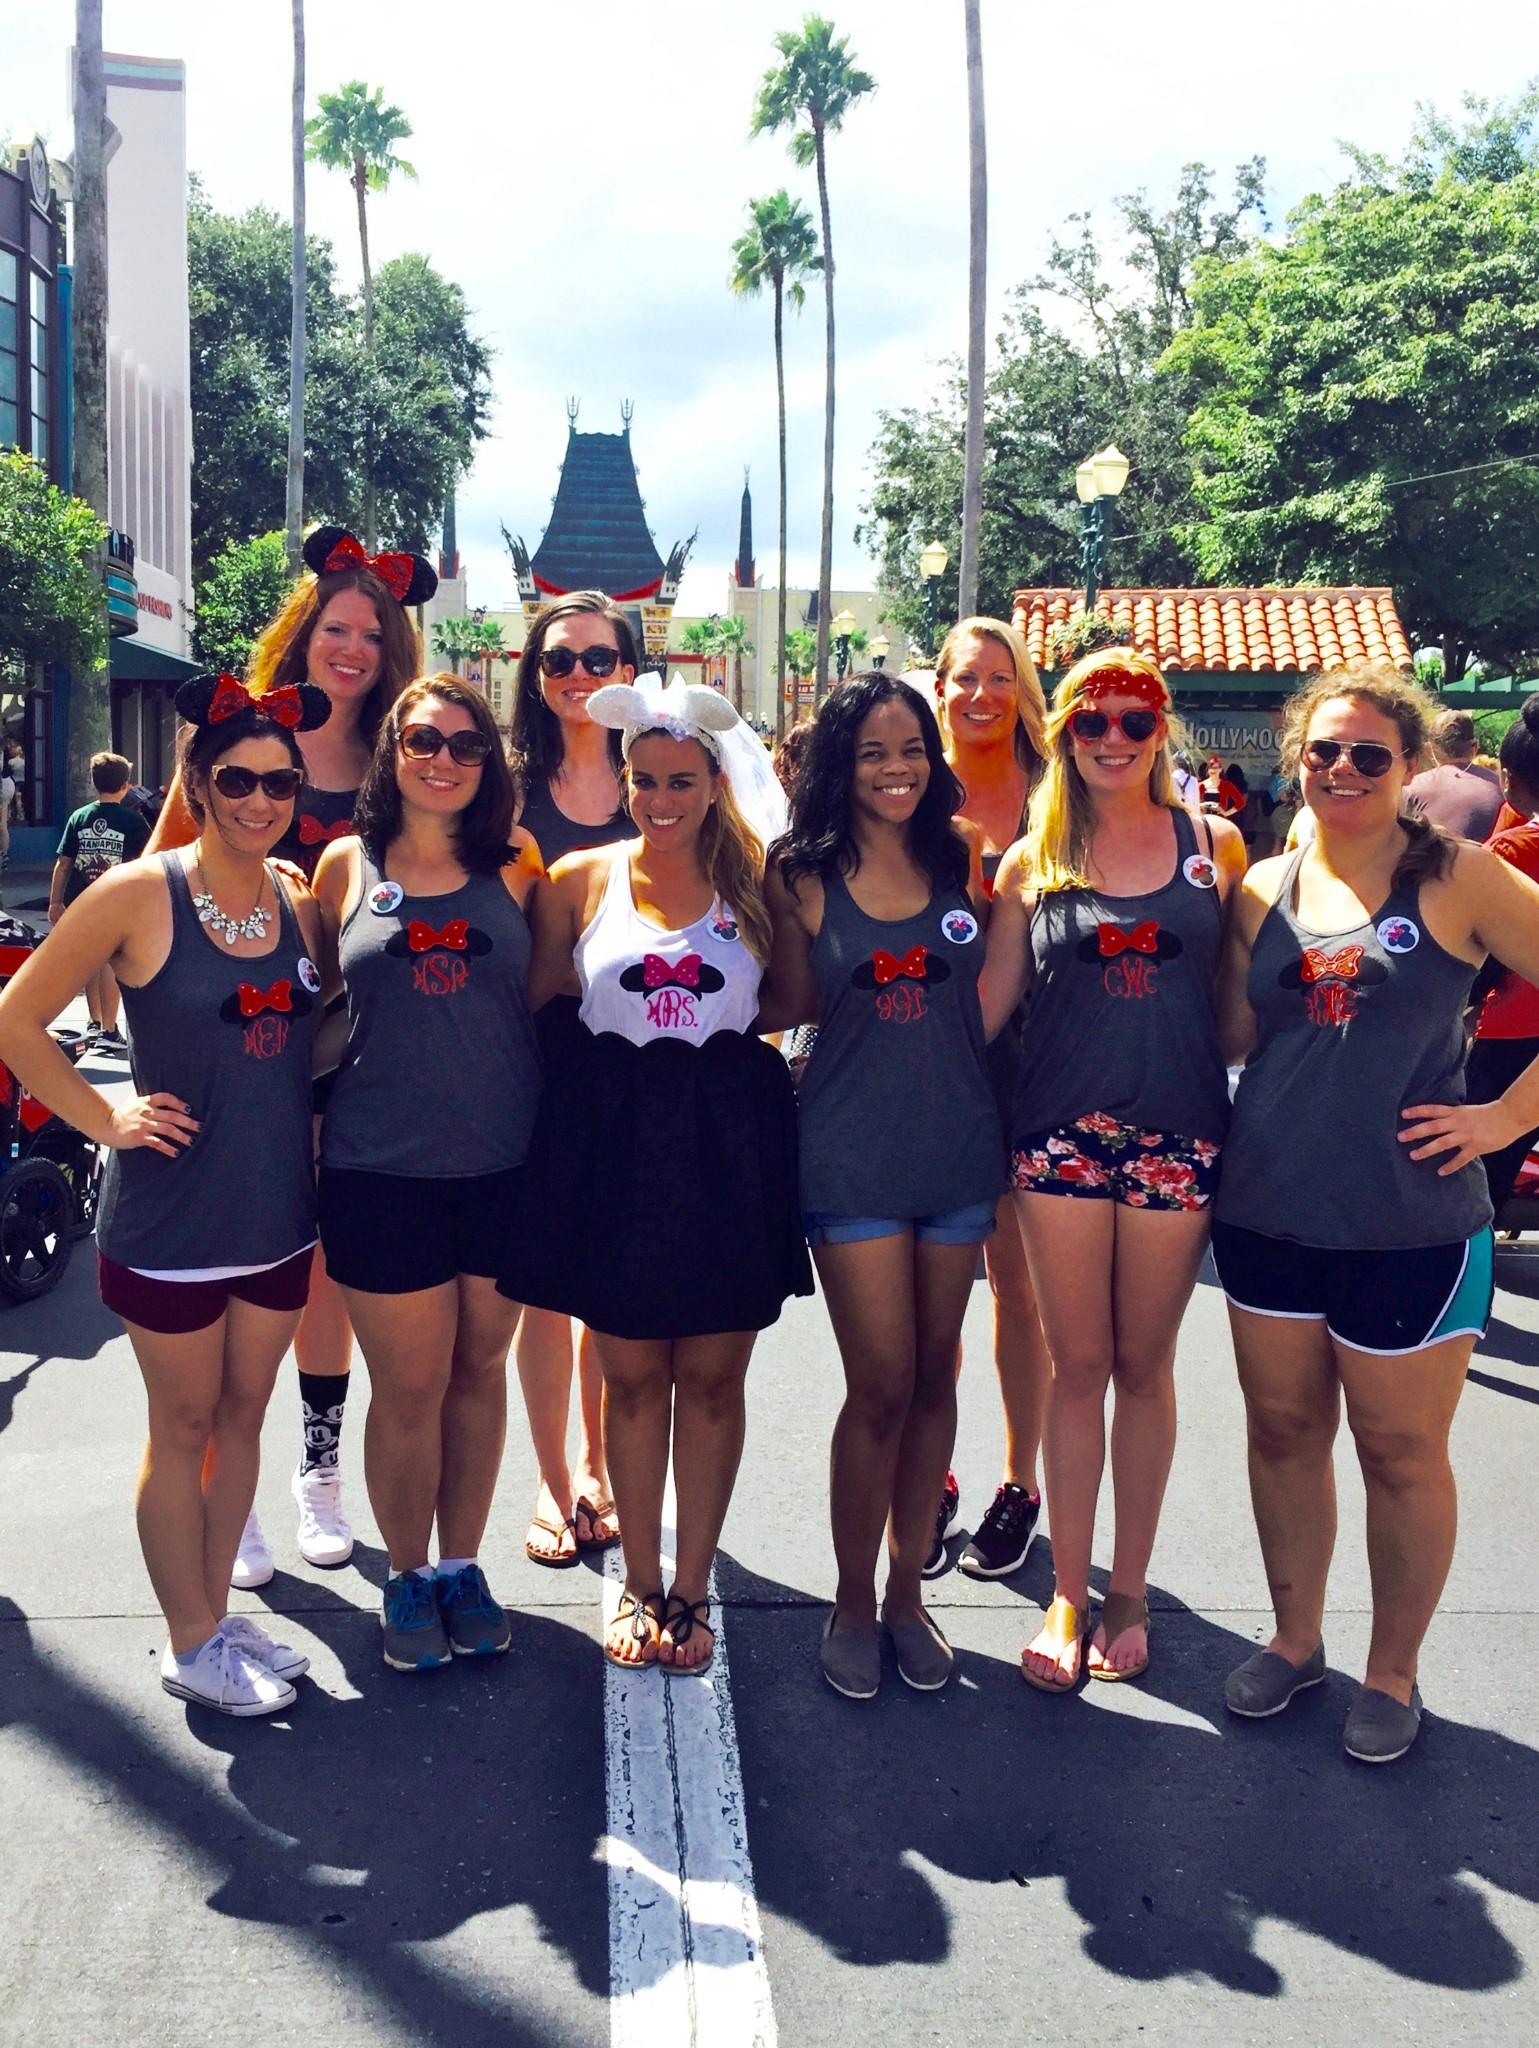 Walt Disney World Bachelorette Party Monogrammed Tank Tops